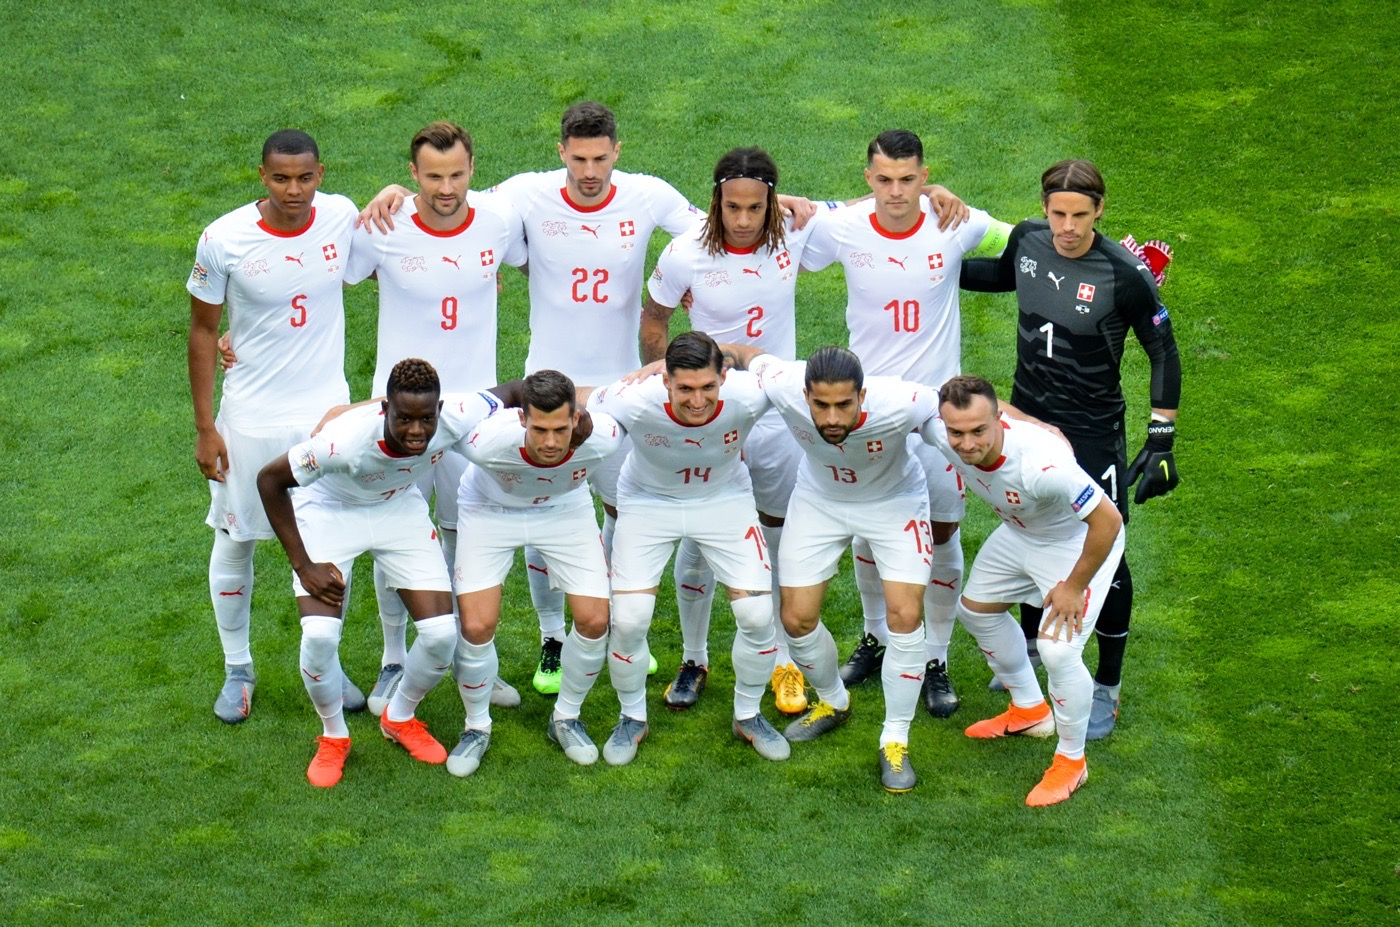 Die Schweizer Nati in der UEFA Nations League gegen Portugal im Juni 2019. (Foto Shutterstock)